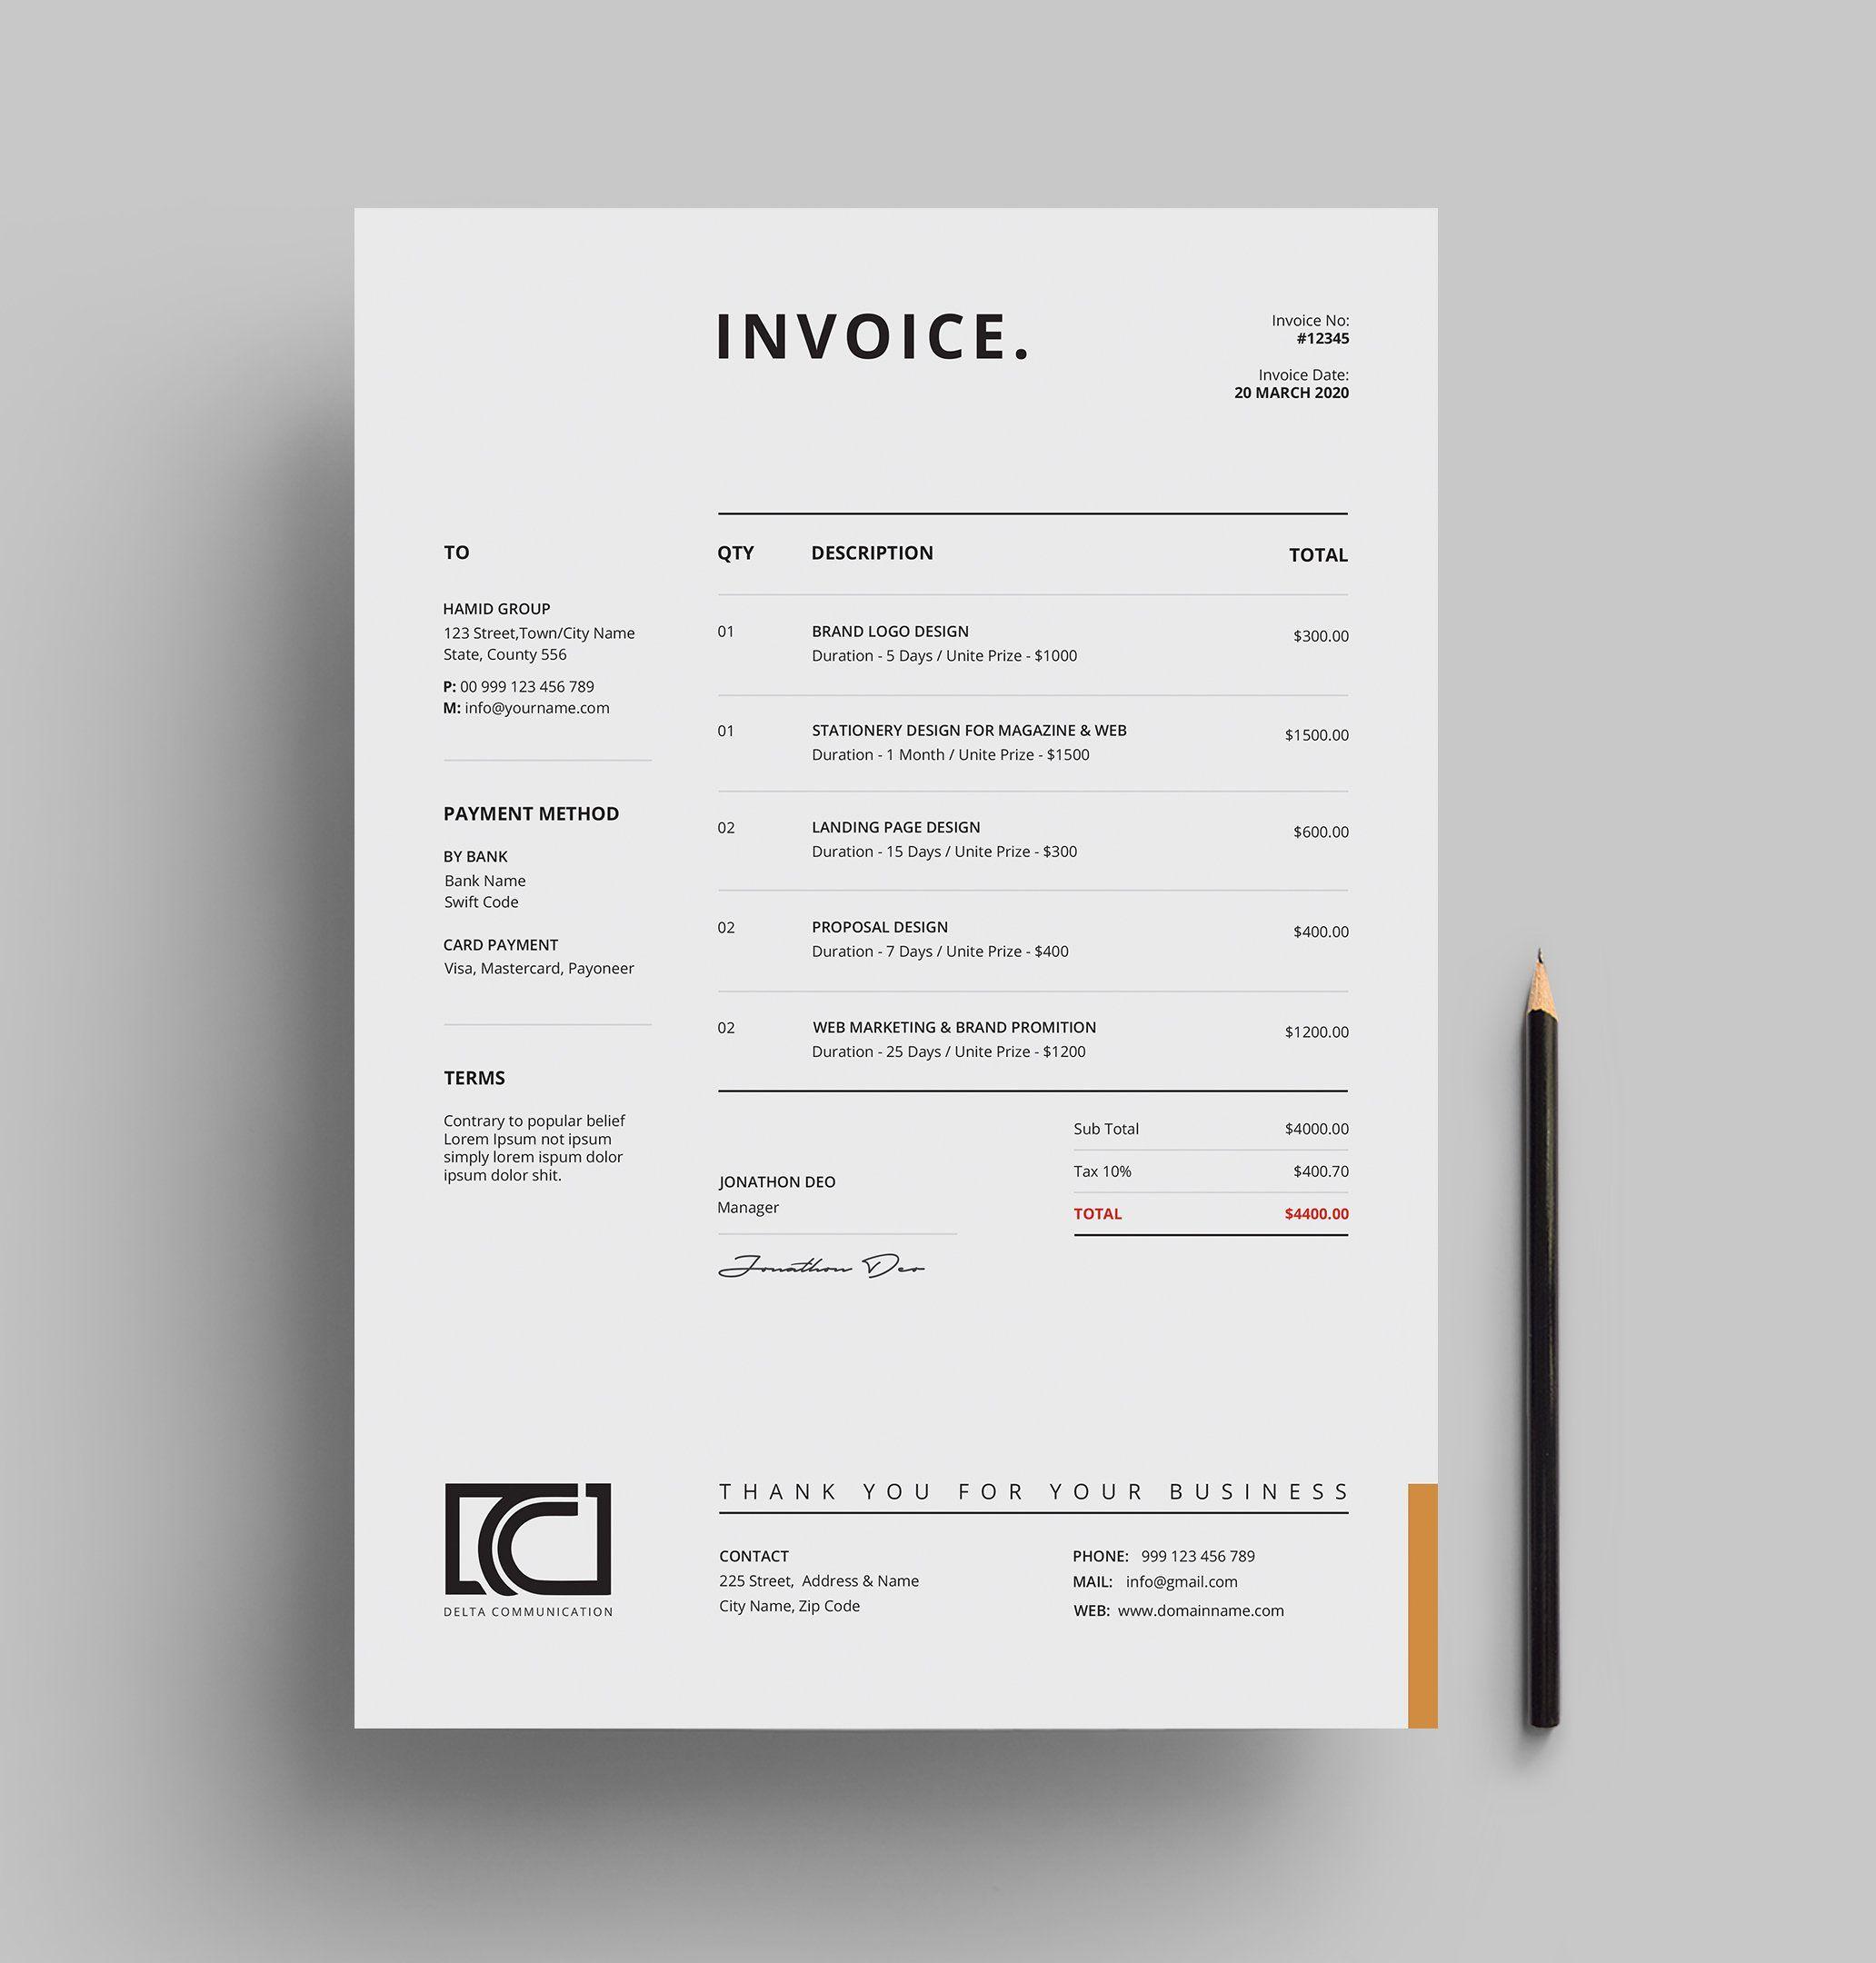 Invoice With Images Invoice Design Invoice Design Template